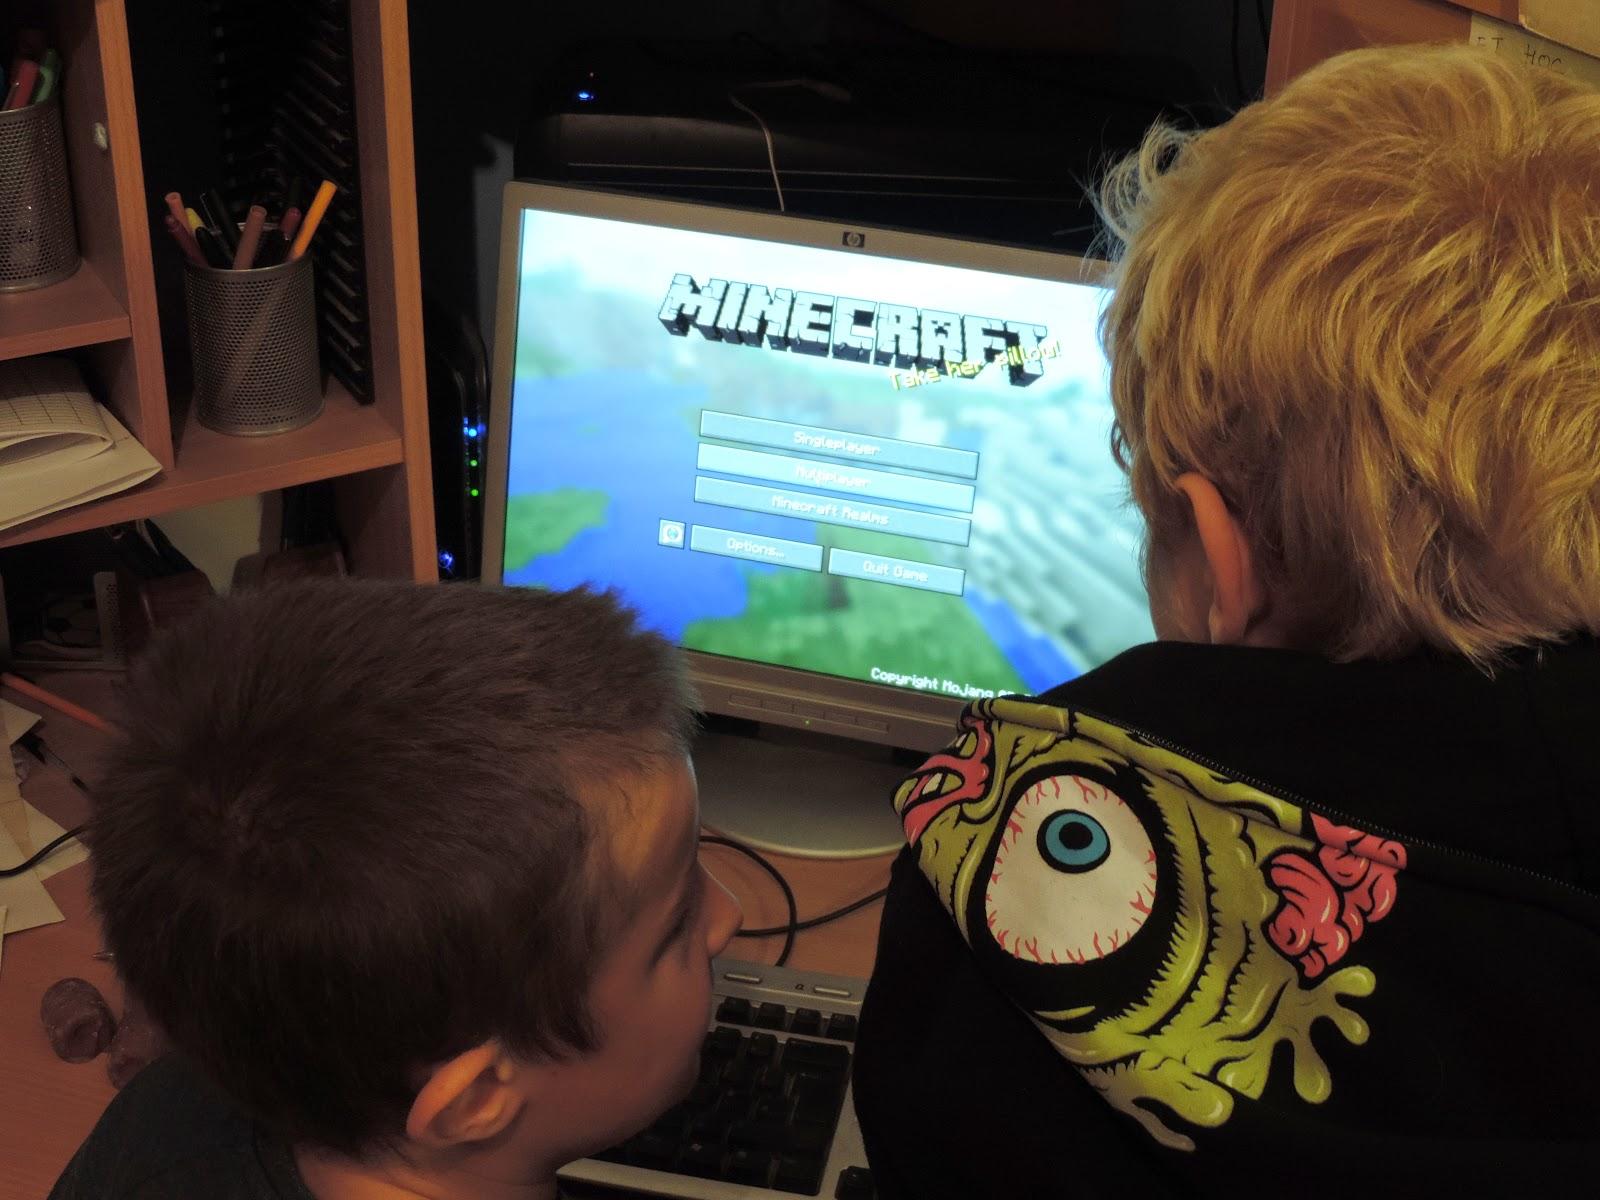 minecraft logon screen on computer